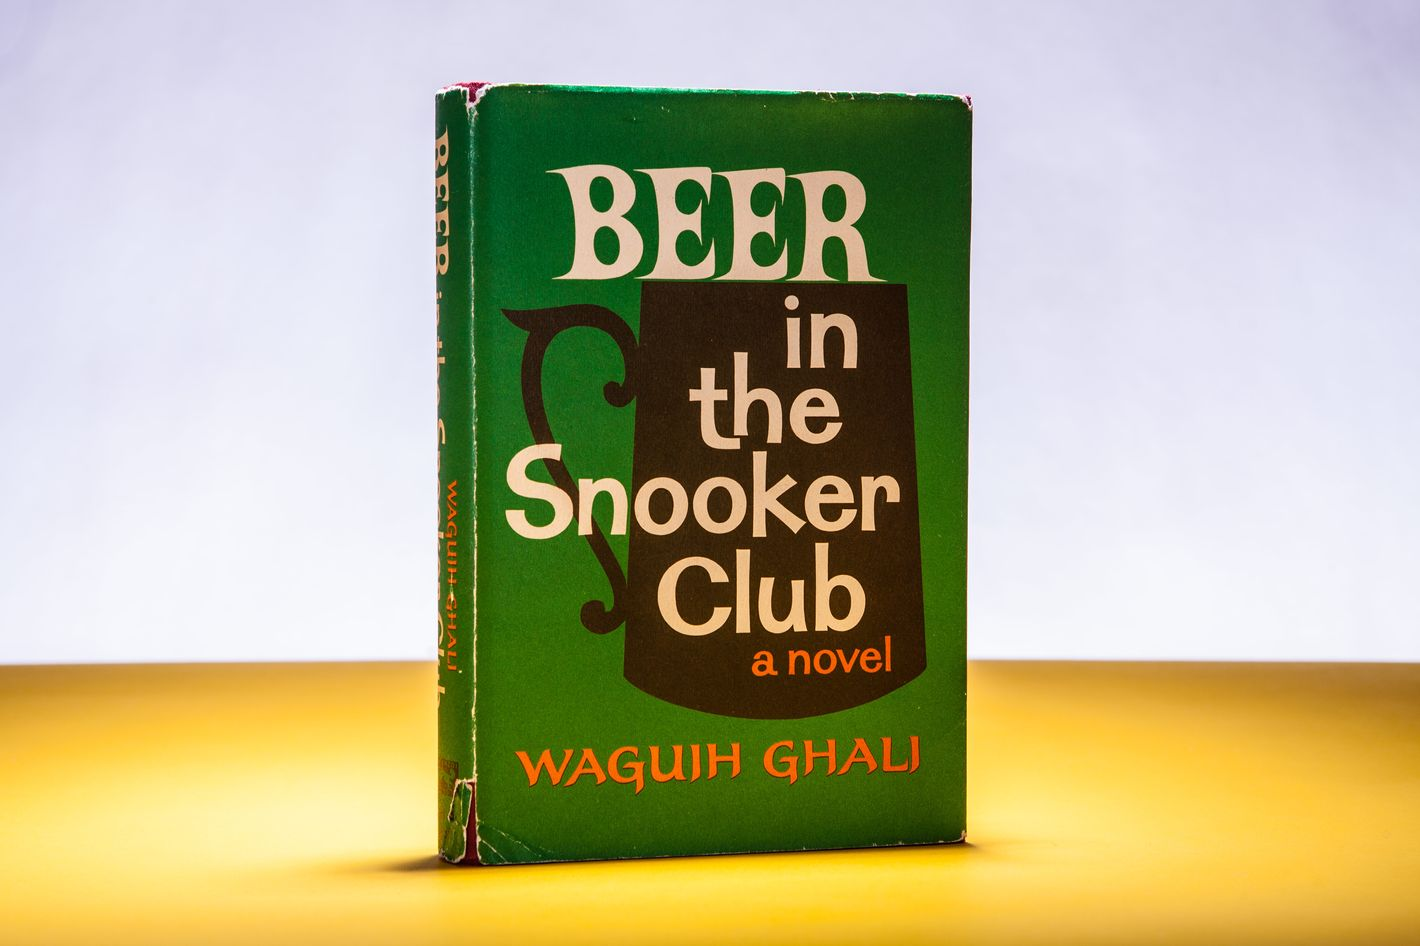 'Beer in the Snooker Club,' Waguih Ghali